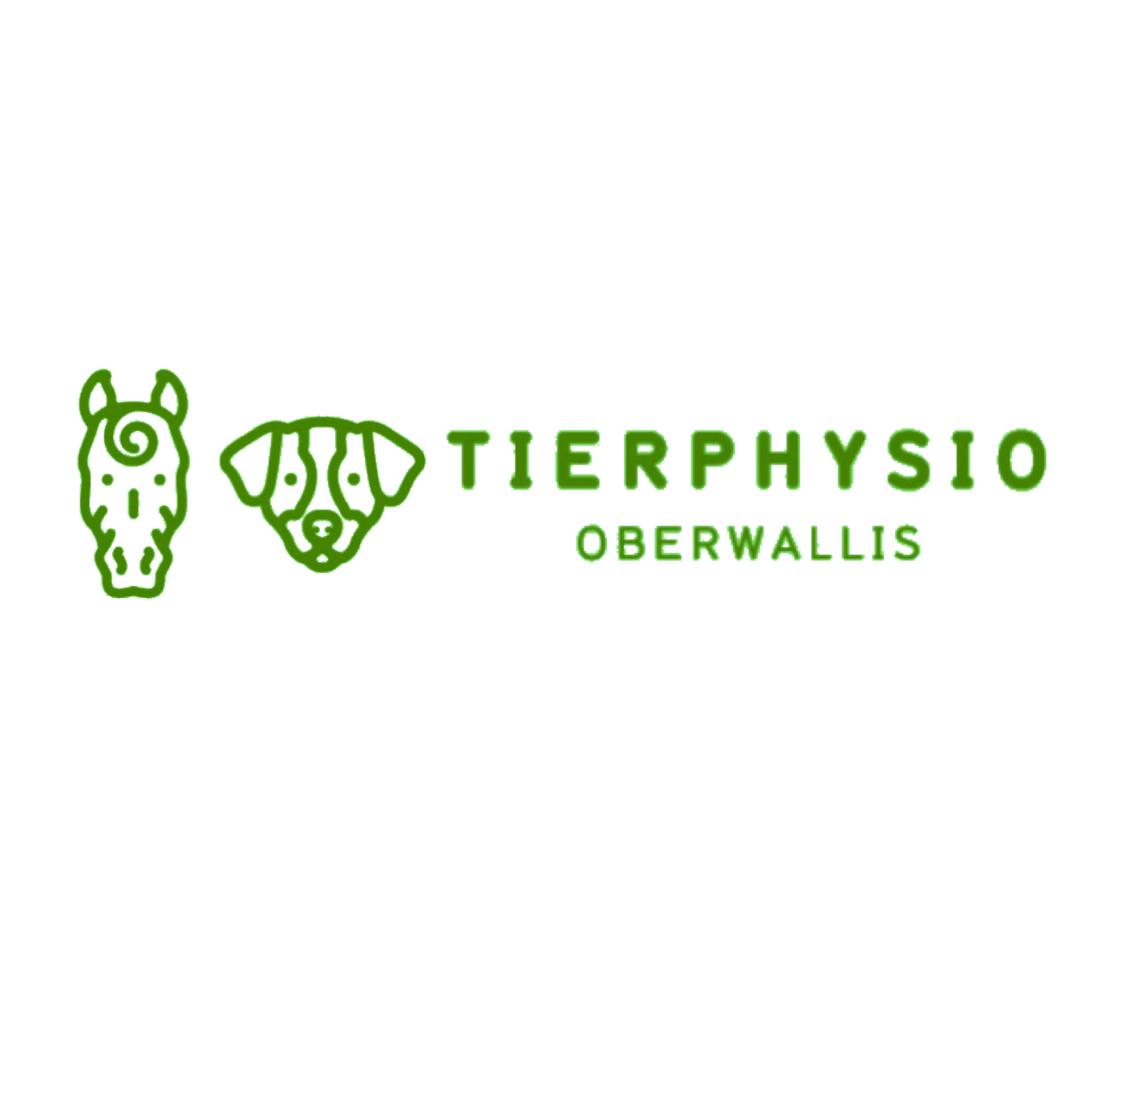 Tierphysio_Oberwallis_Logo